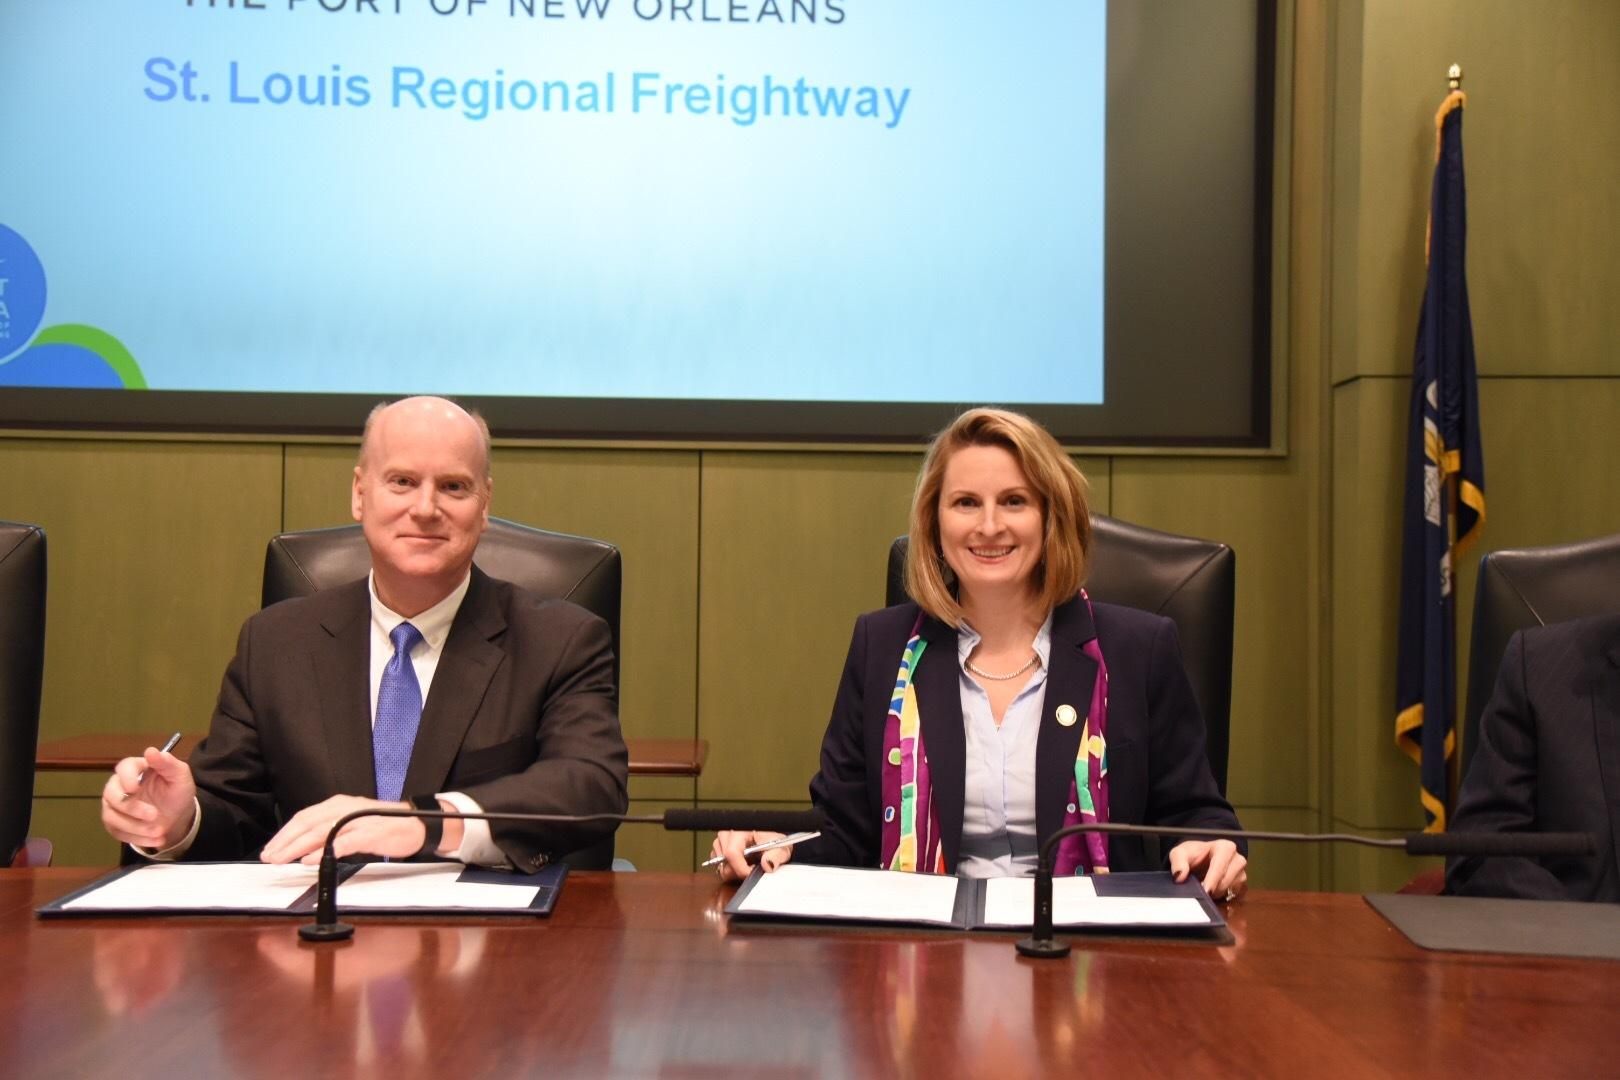 Press Release 2017 02 23 St  Louis Regional Freightway Img 4983